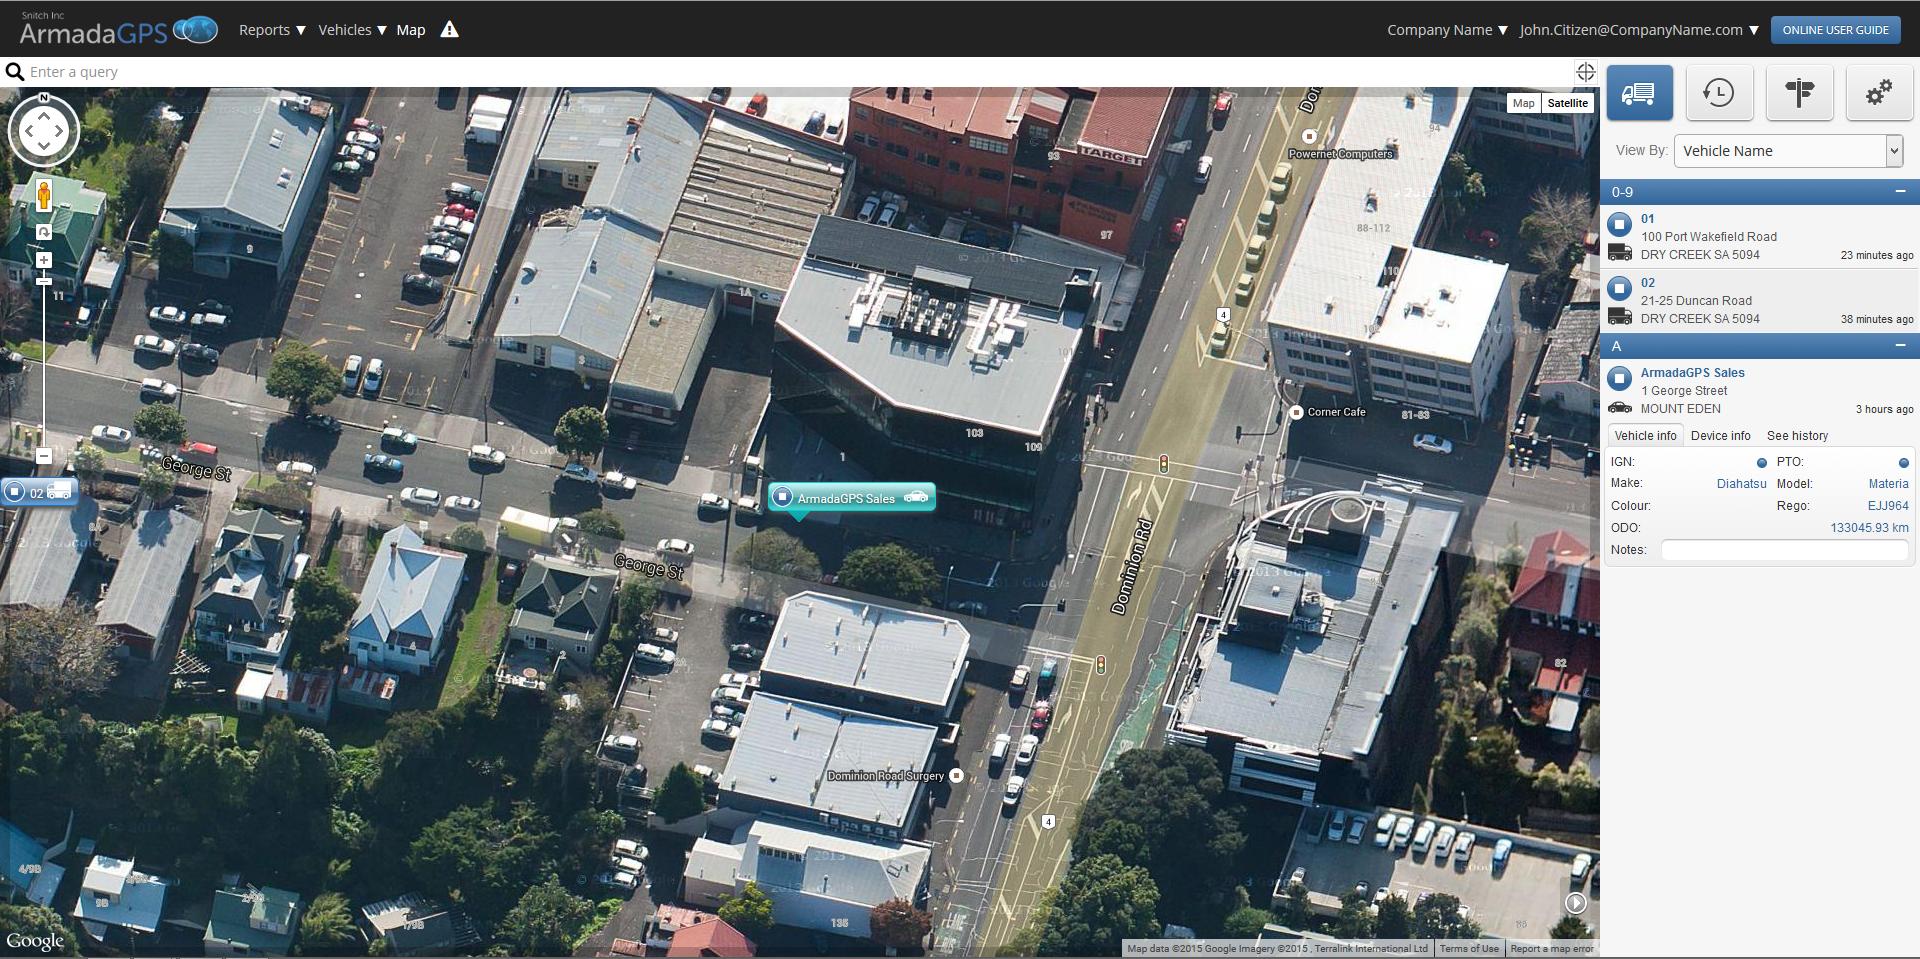 Google Satellite View